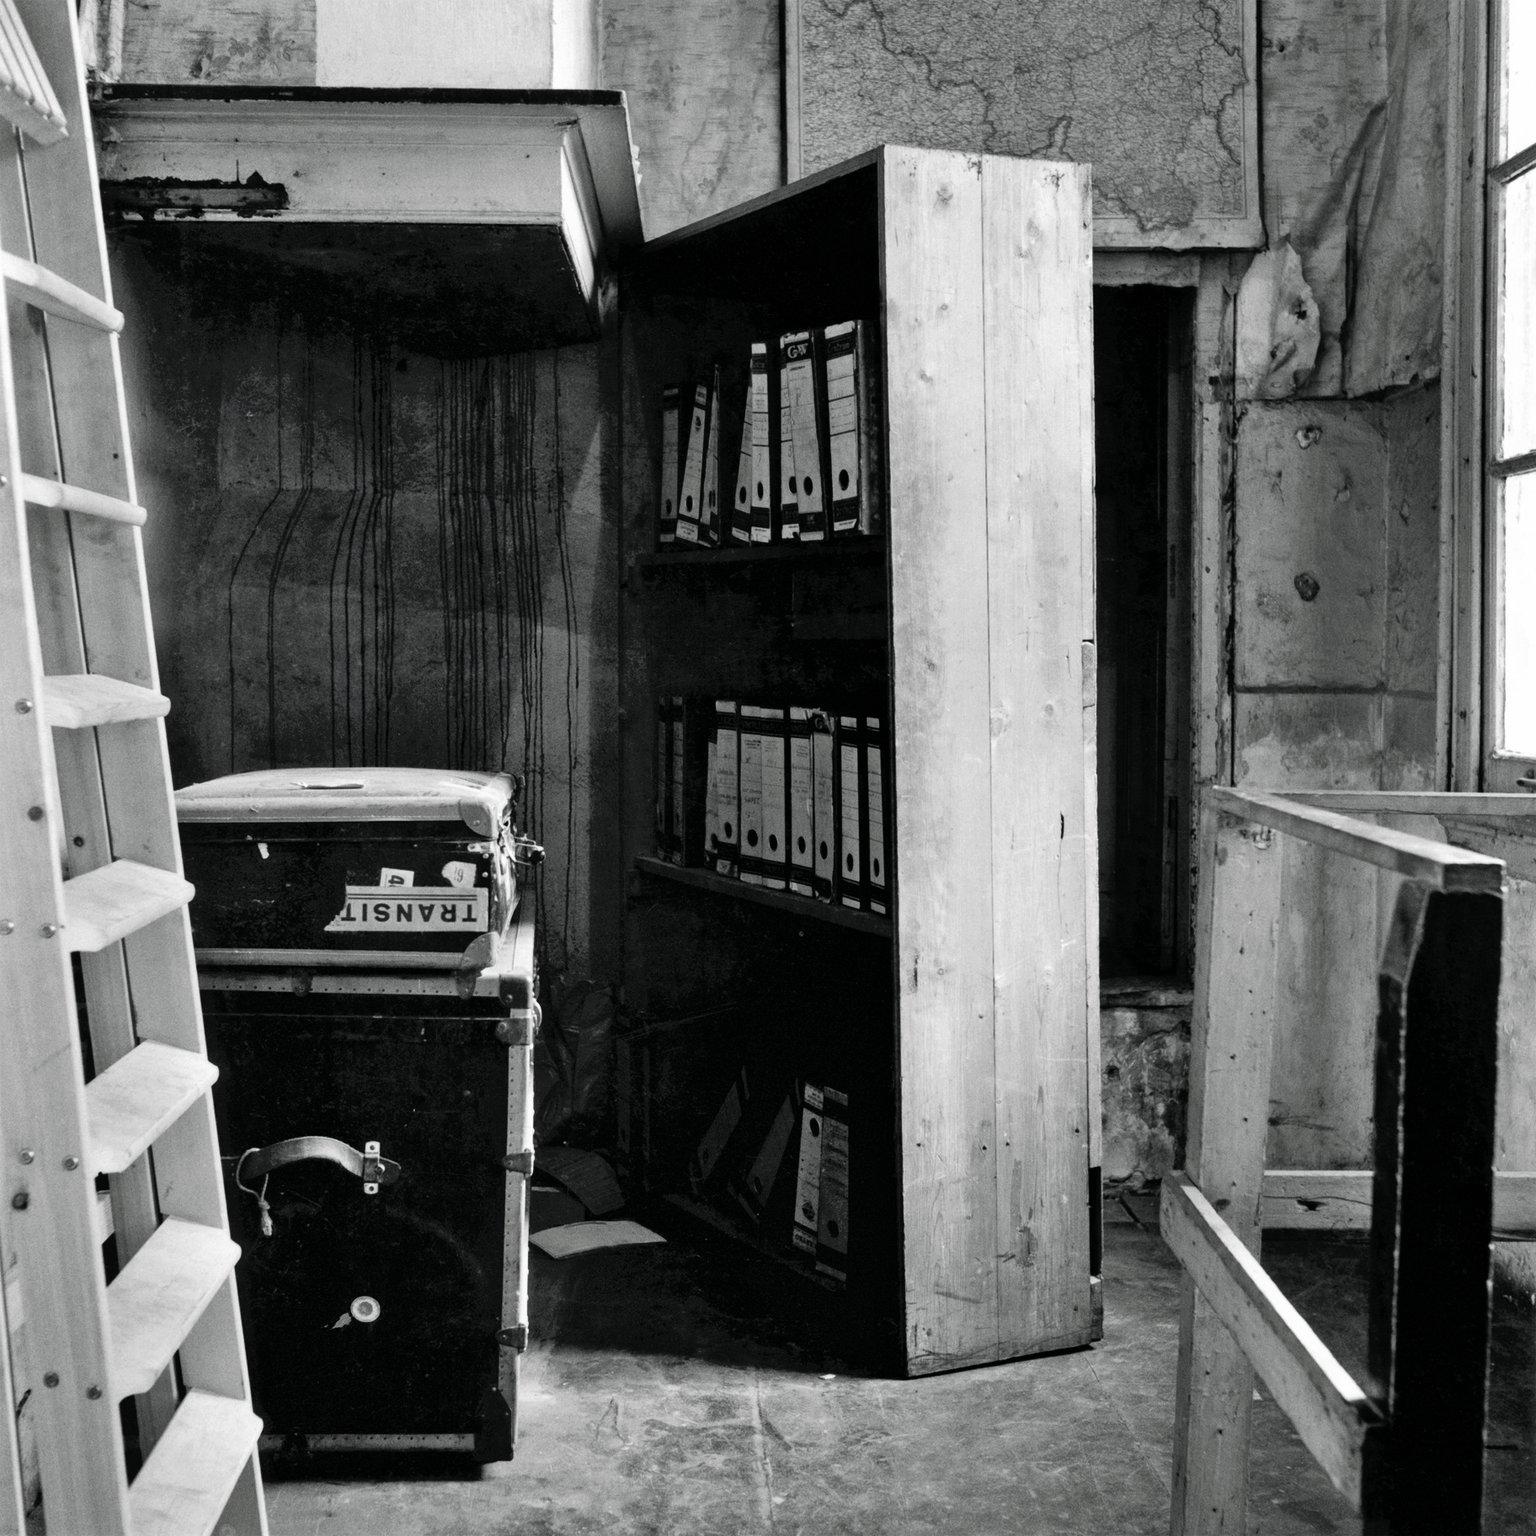 Johan Voskuijl built the bookcase that hid the entrance to the Secret Annex.